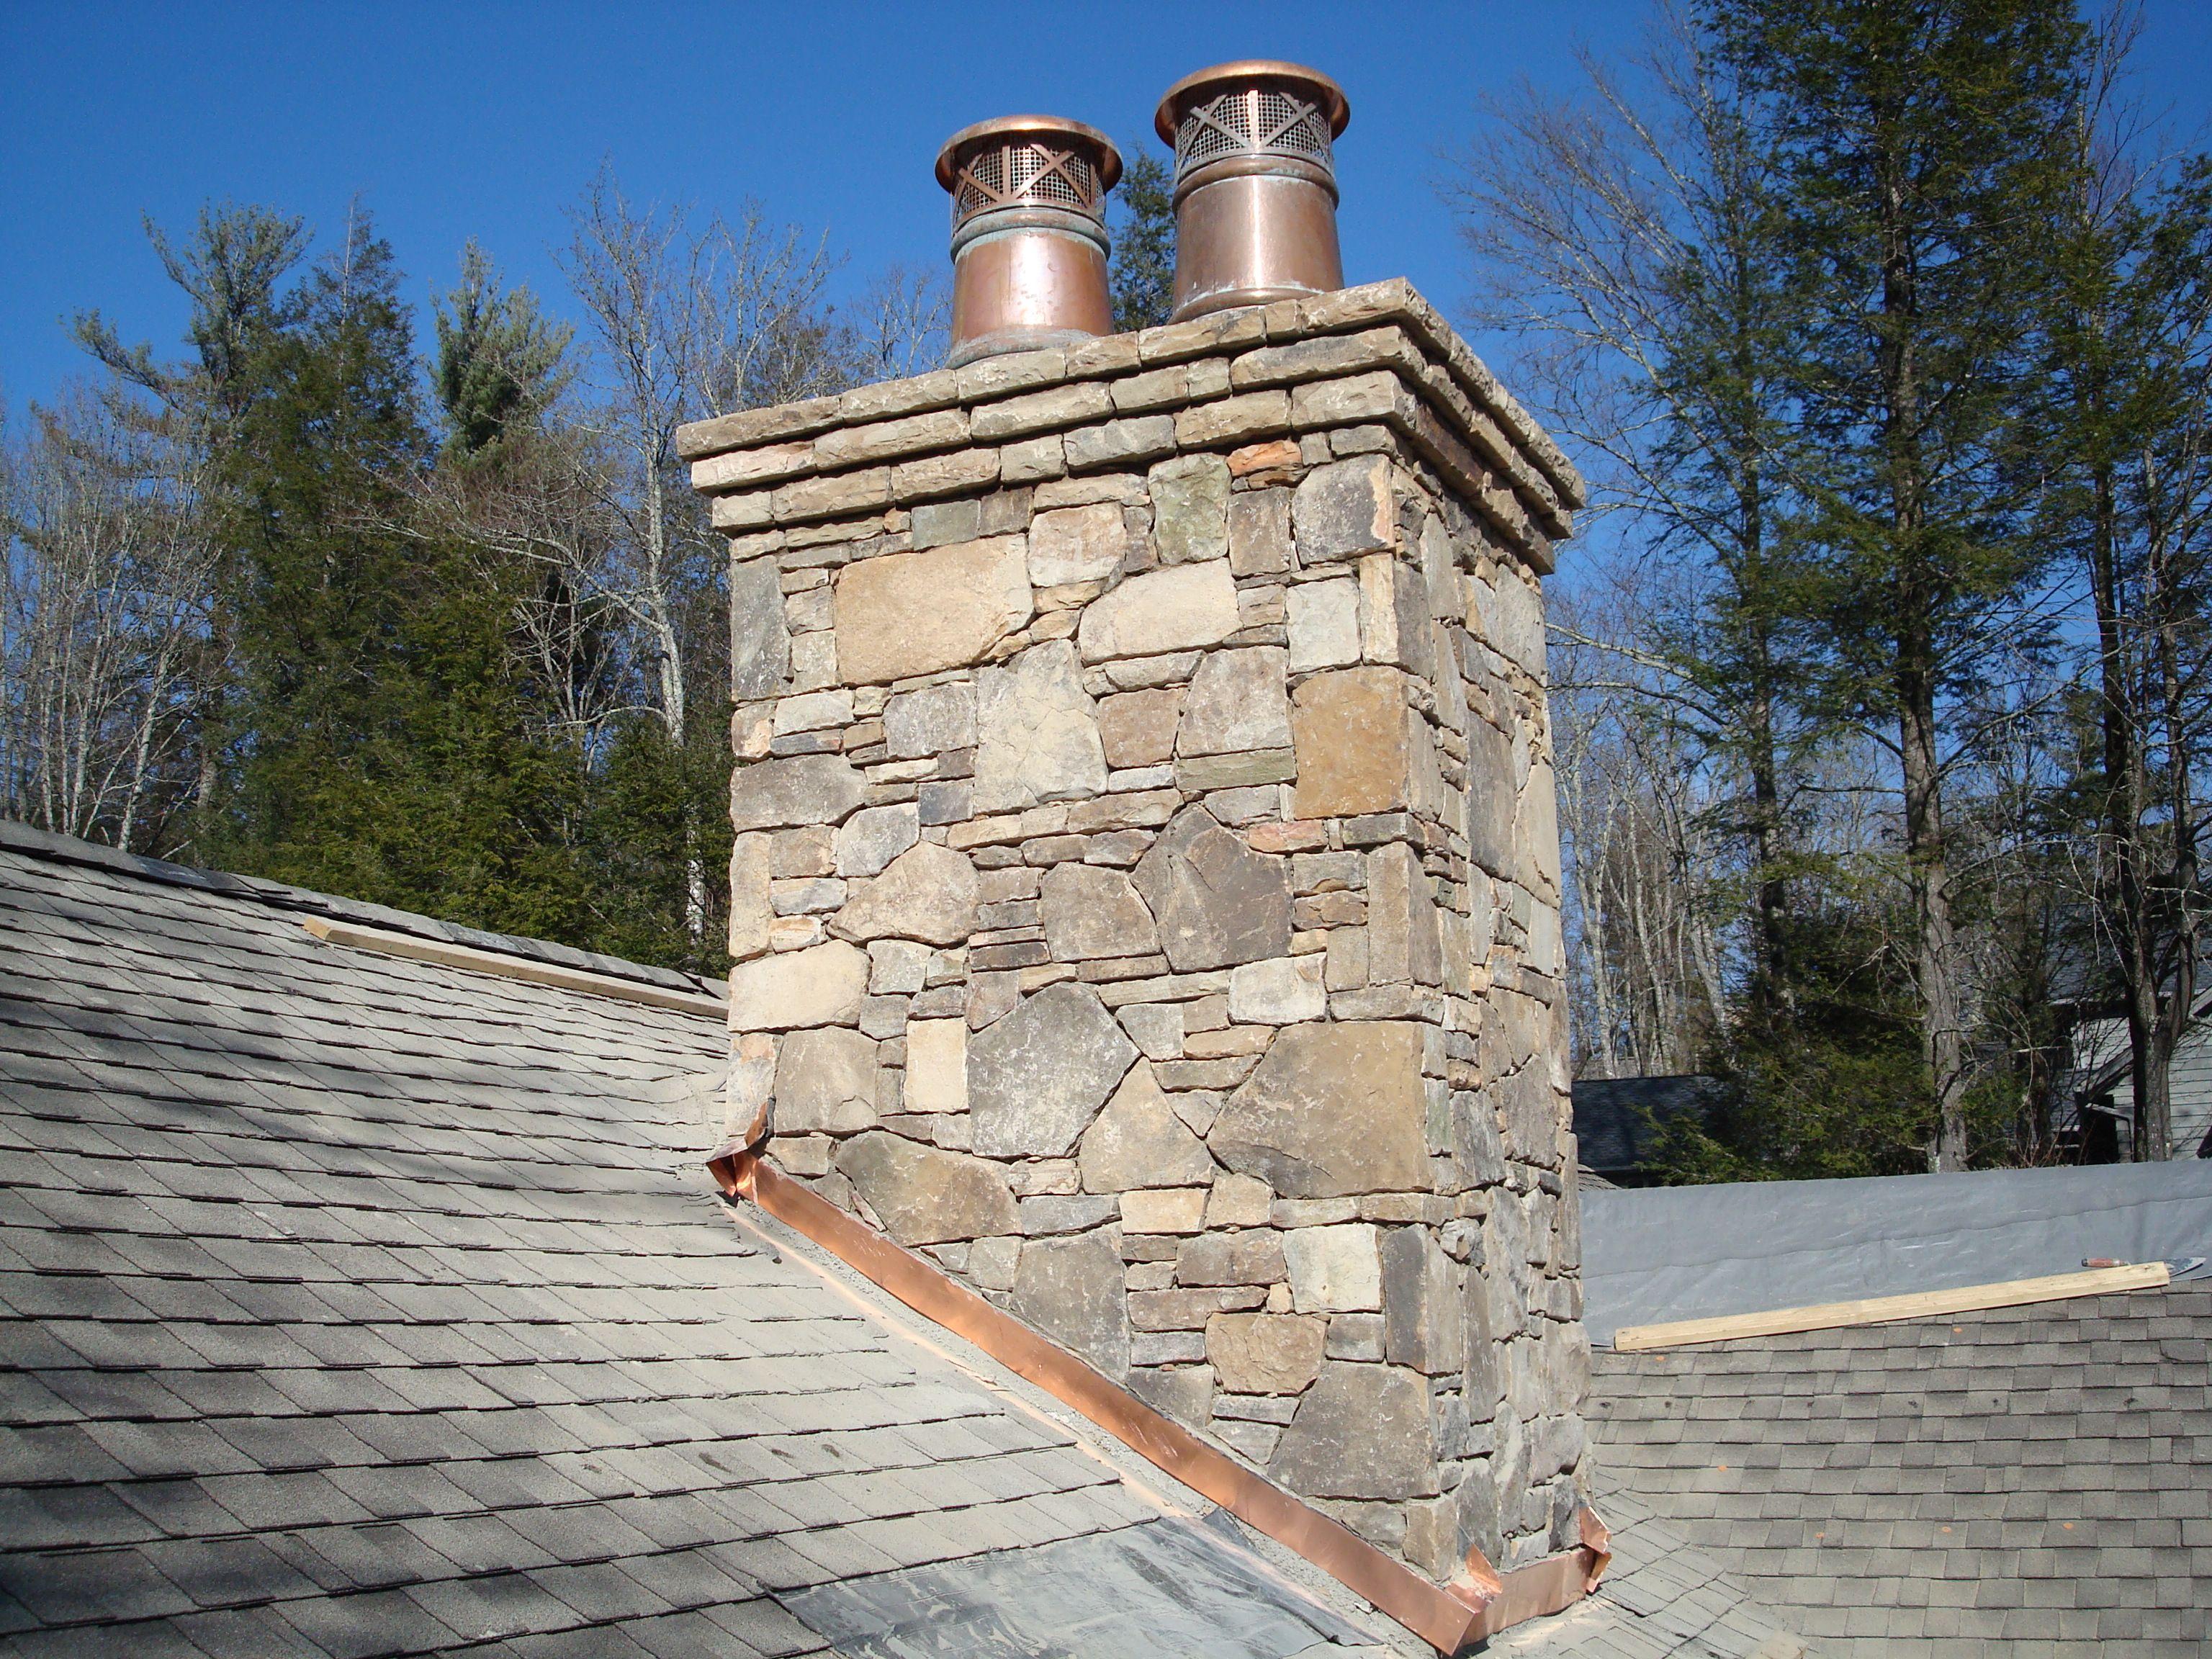 Fieldstone Stone Veneer   We Have Over 8000 Acres Of Rock On Our Property  For All. Rock VeneerStone ExteriorRock OnFireplace IdeasModern ...